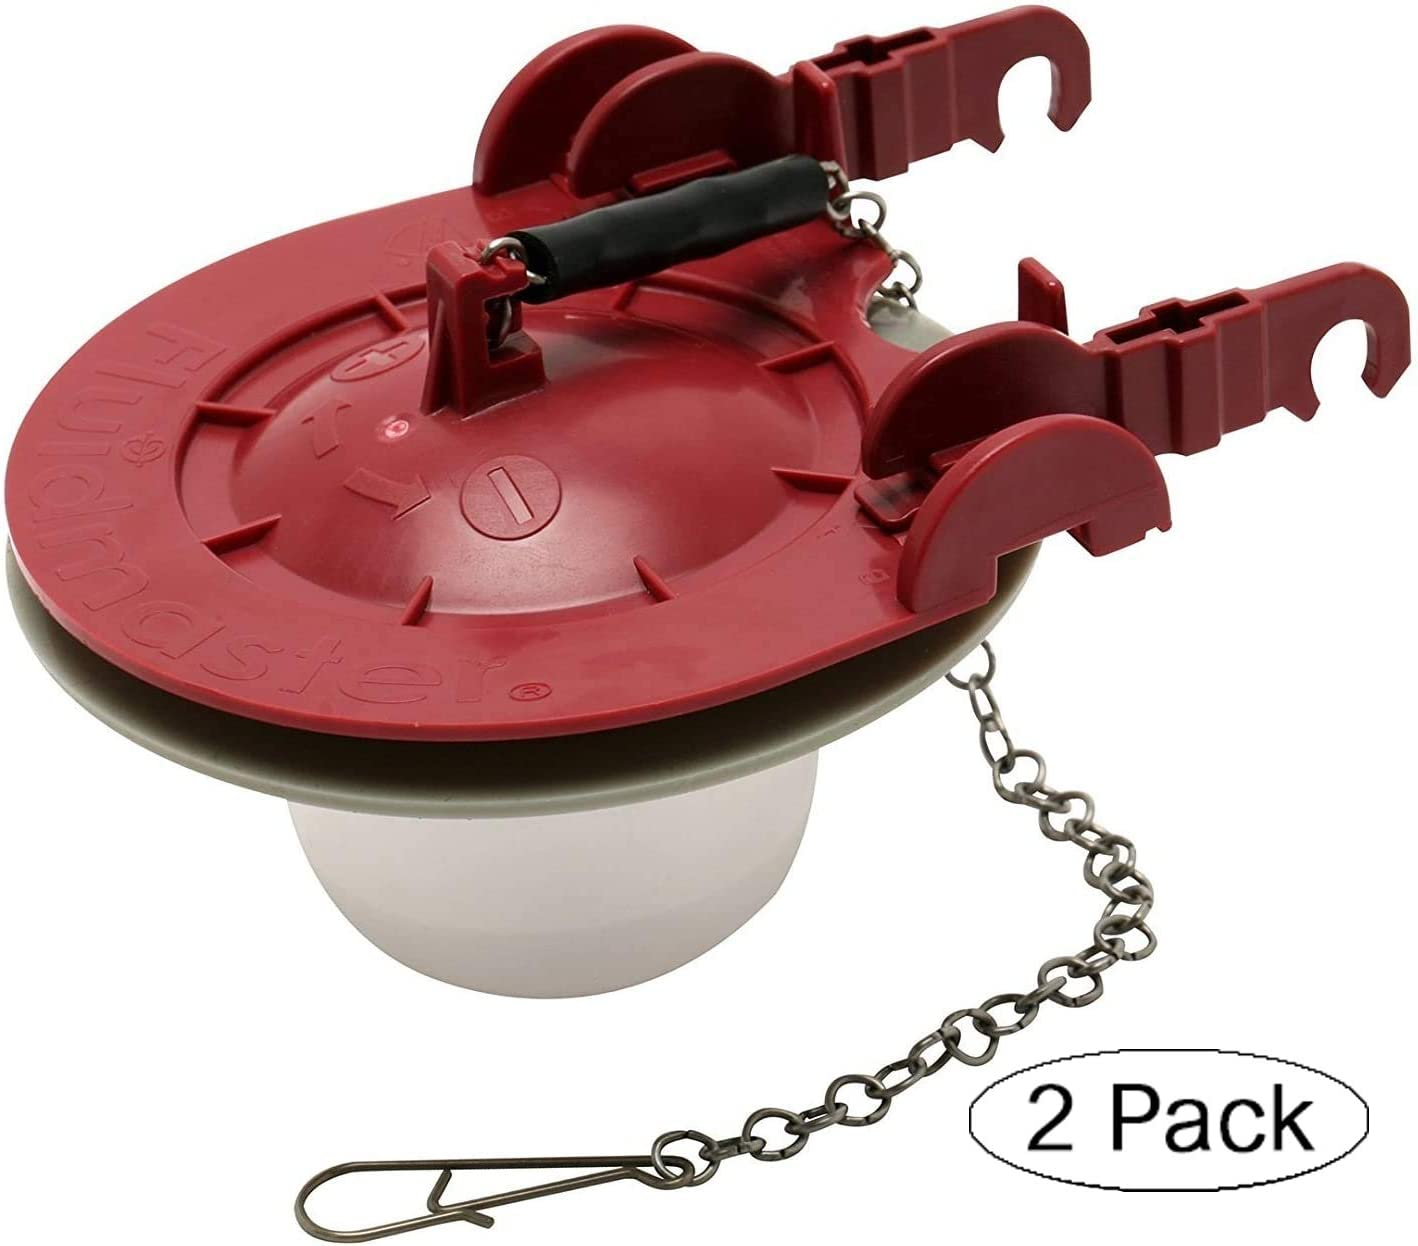 2 Fluidmaster 5403 3-Inch Universal Water Saving Long Life Toilet Flapper Adjustable Solid Frame Design